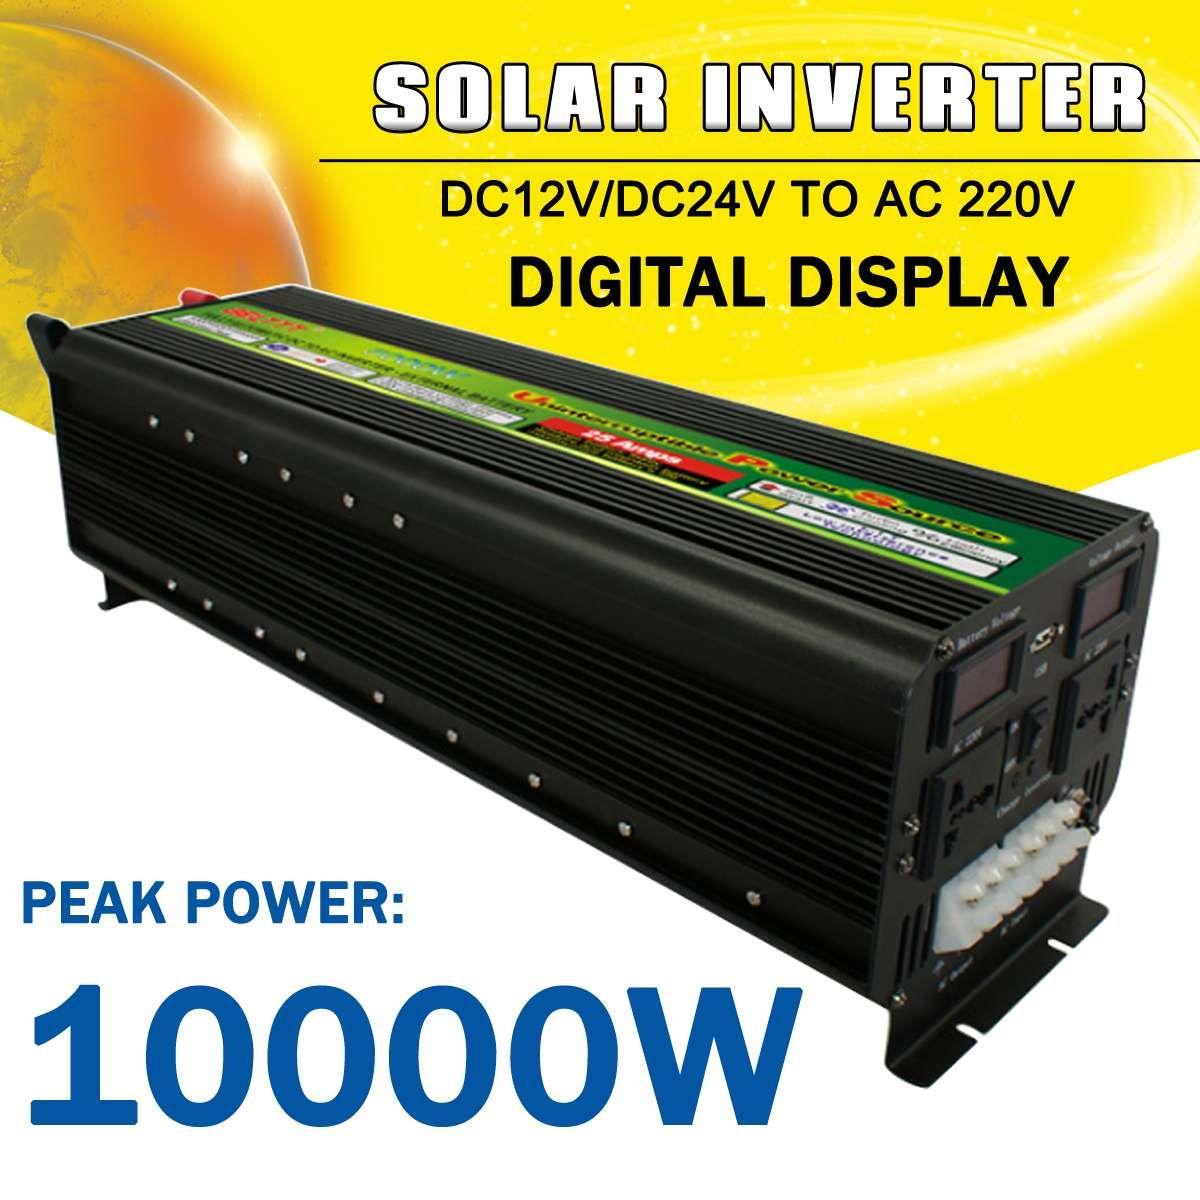 Solar Power Inverter 10000 W Max DC 12 V/24 V zu AC 220 V LCD Display Modifizierte Sinus welle Konverter Auto Adapter Ladung für Home Auto